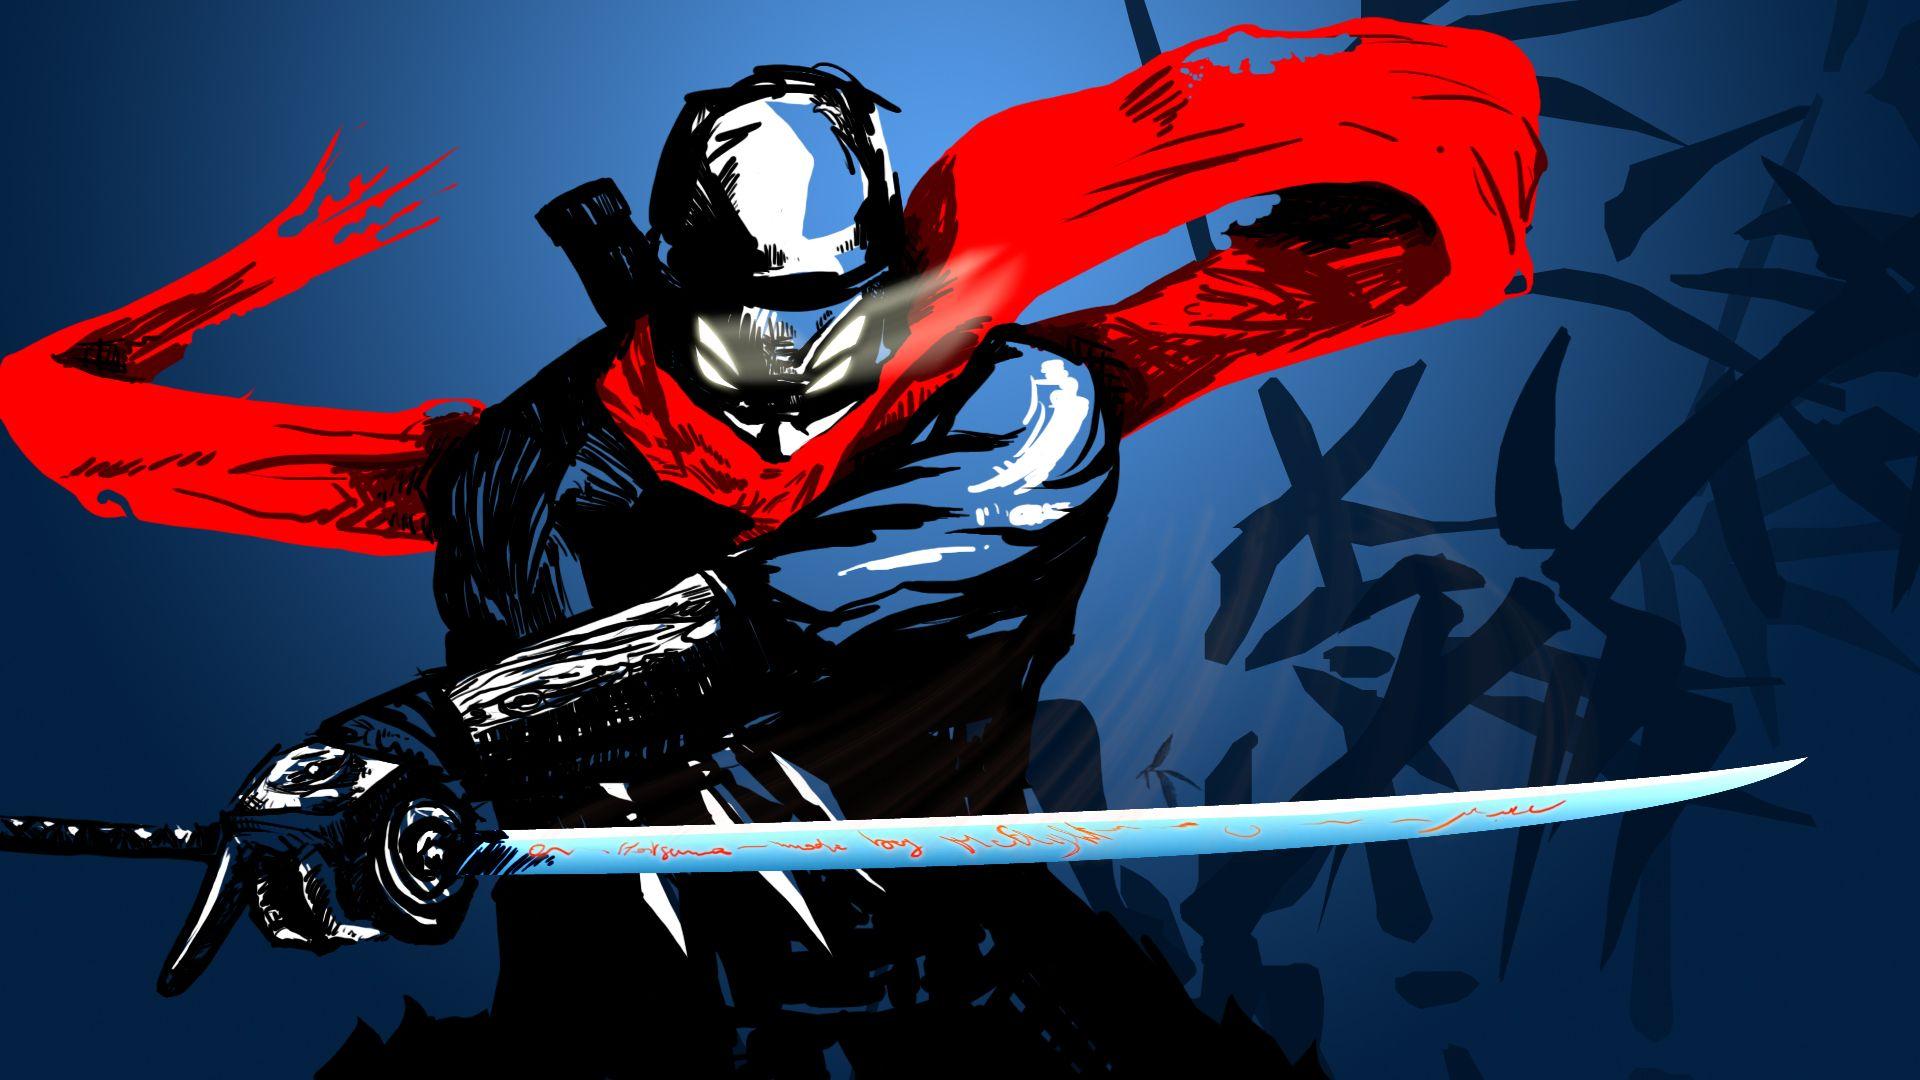 Hotsuma the Ninja Shinobi Anime warrior, Ninja art